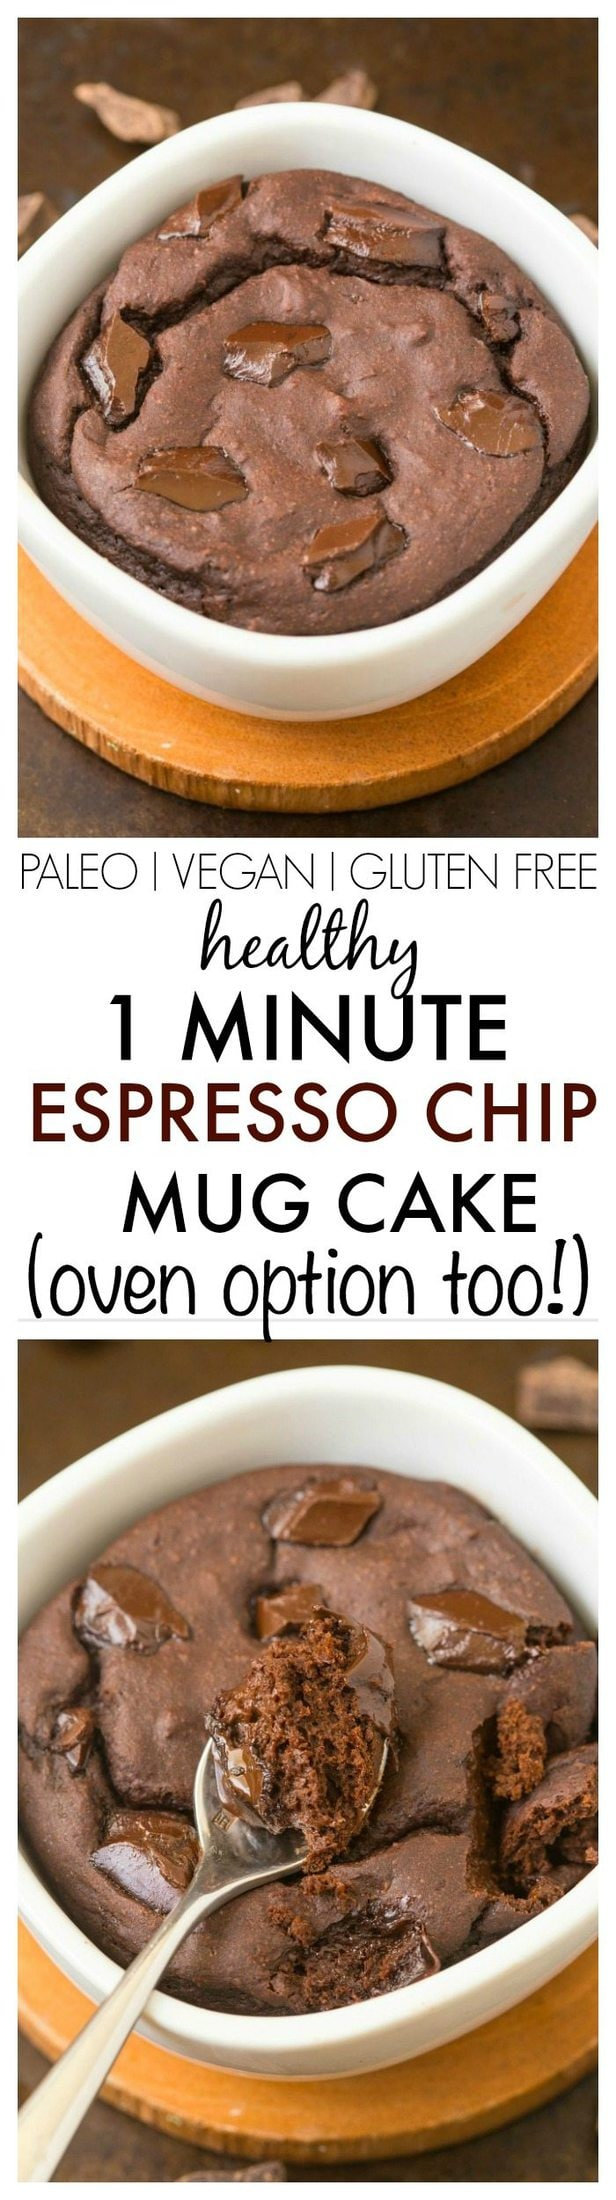 Healthy 1 Minute Espresso Chip Mug Cake- Tasting just like tiramisu, this delicious single serve cake is light, fluffy and has NO butter, NO oil, NO grains and NO sugar- Oven option too! {vegan, gluten free, paleo recipe}- thebigmansworld.com